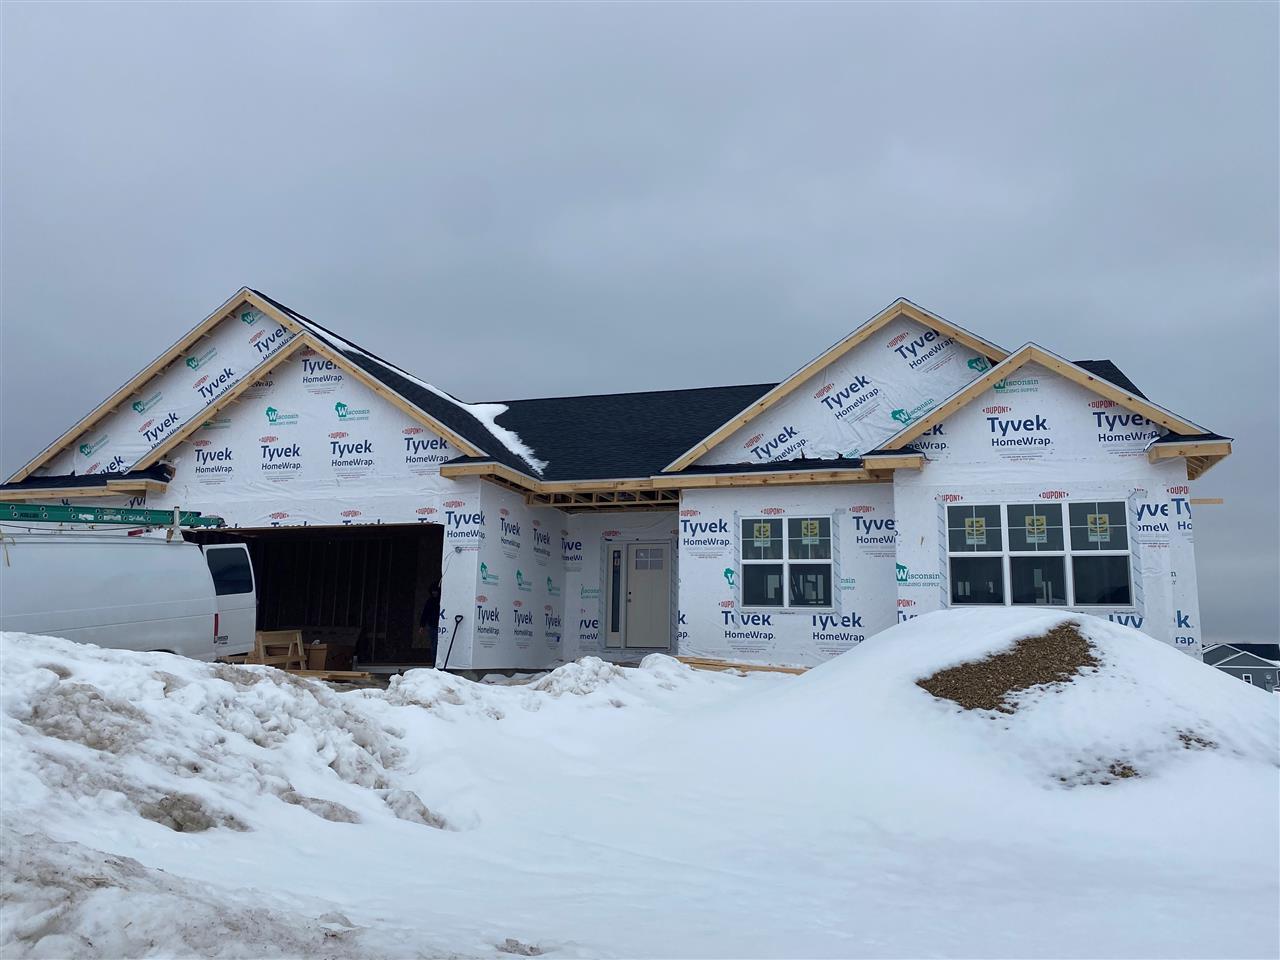 1663 Liatris Dr, Sun Prairie, Wisconsin 53590, 5 Bedrooms Bedrooms, ,4 BathroomsBathrooms,Single Family,For Sale,1663 Liatris Dr,1,1903295